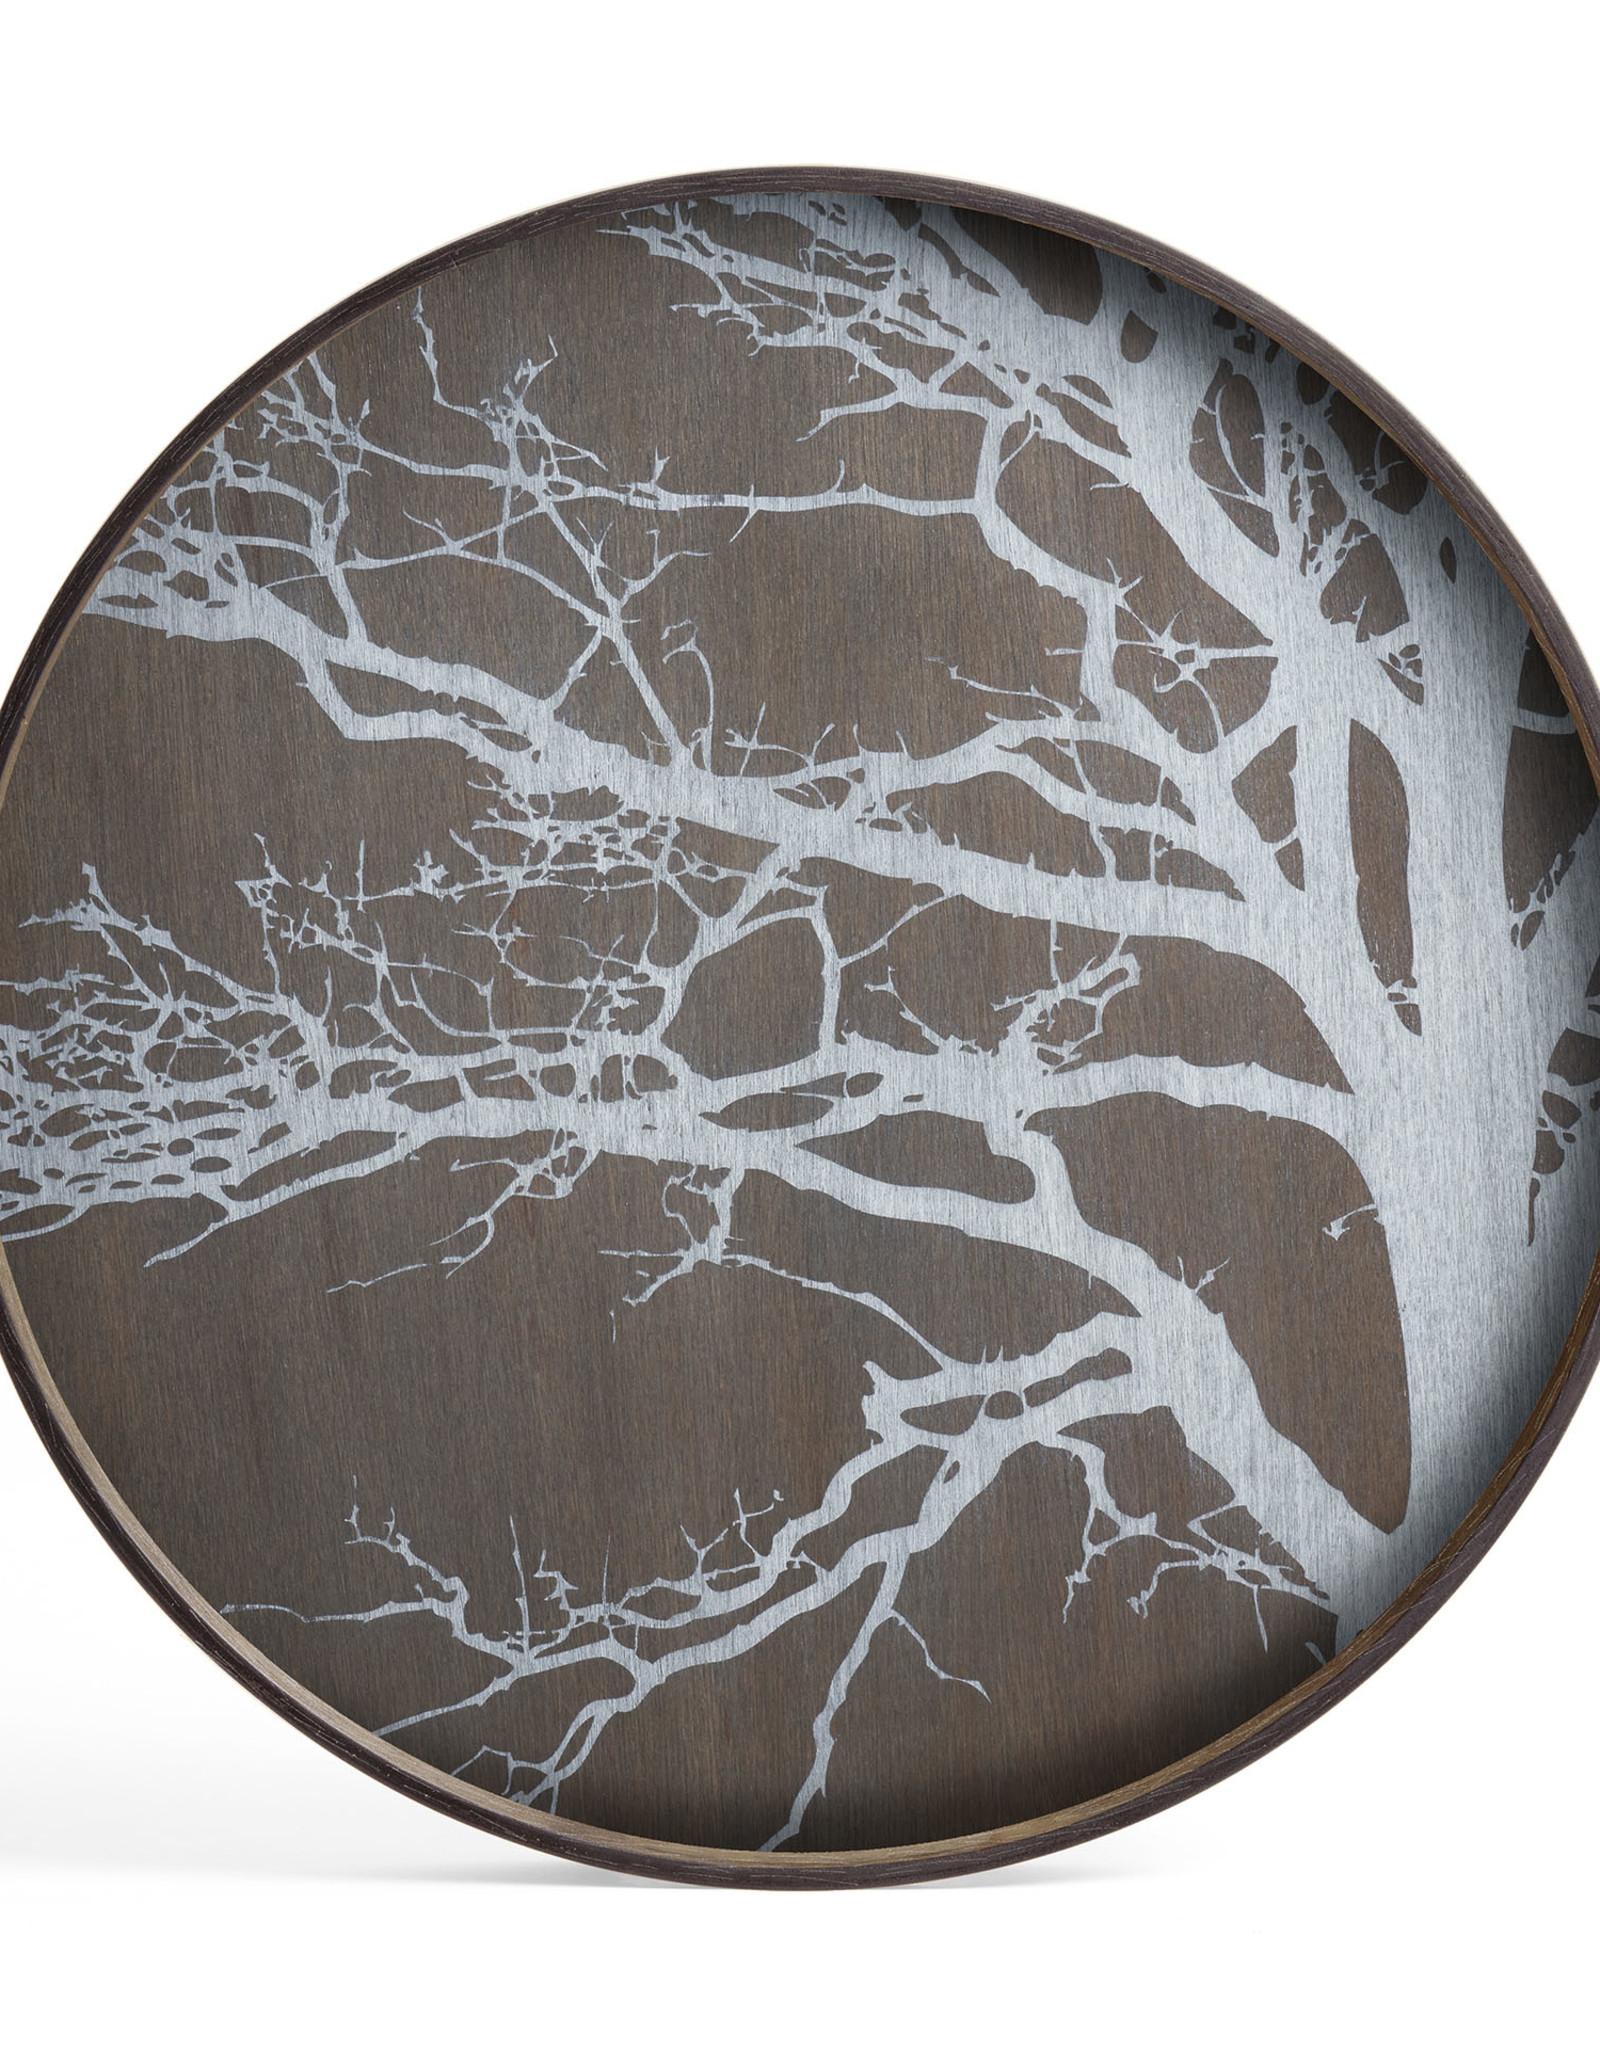 White Tree wooden tray - round - L 24 x 24 x 2